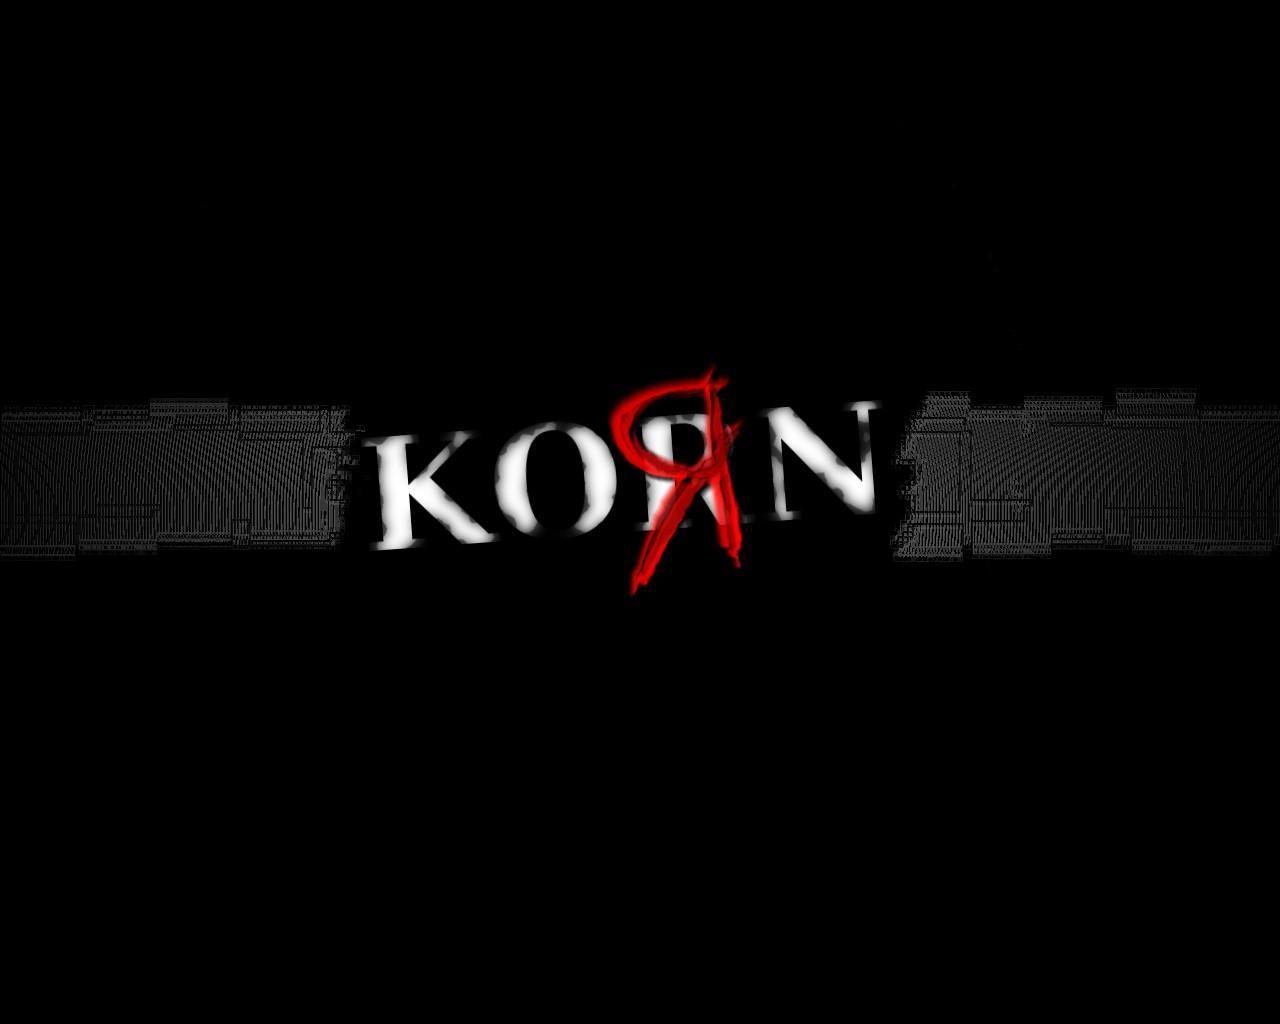 Korn Music Wallpapers Free Desktop 8 Music Wallpaper Korn Heavy Metal Bands